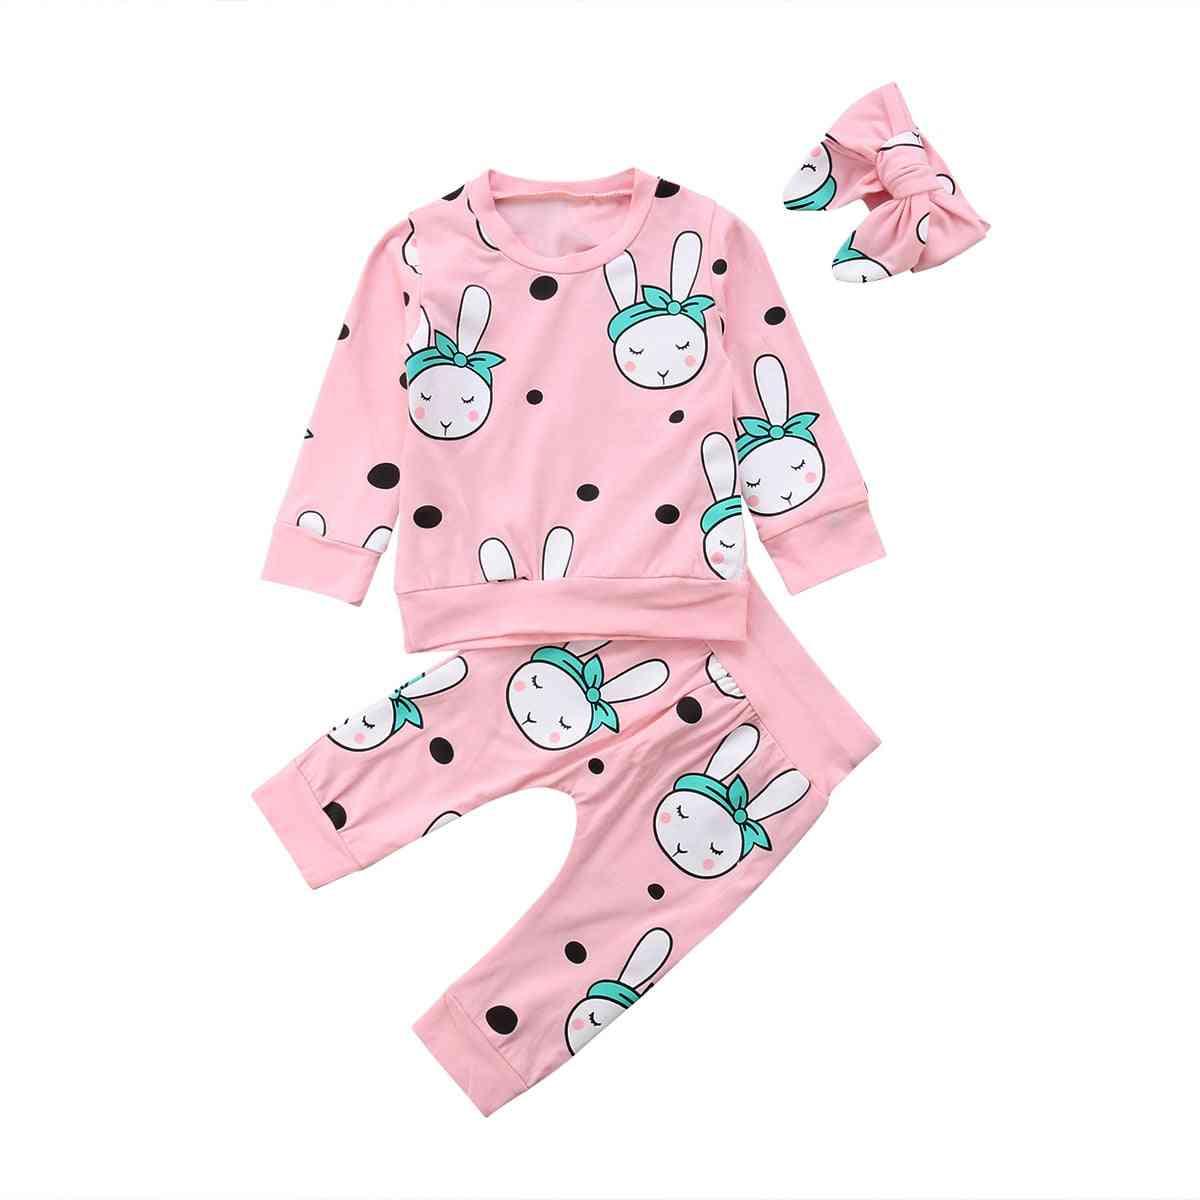 Autumn Winter Newborn Girl / Boy Sleeper Clothes Set, Long Sleeve Cartoon Rabbit Tops & Pant Pyjamas